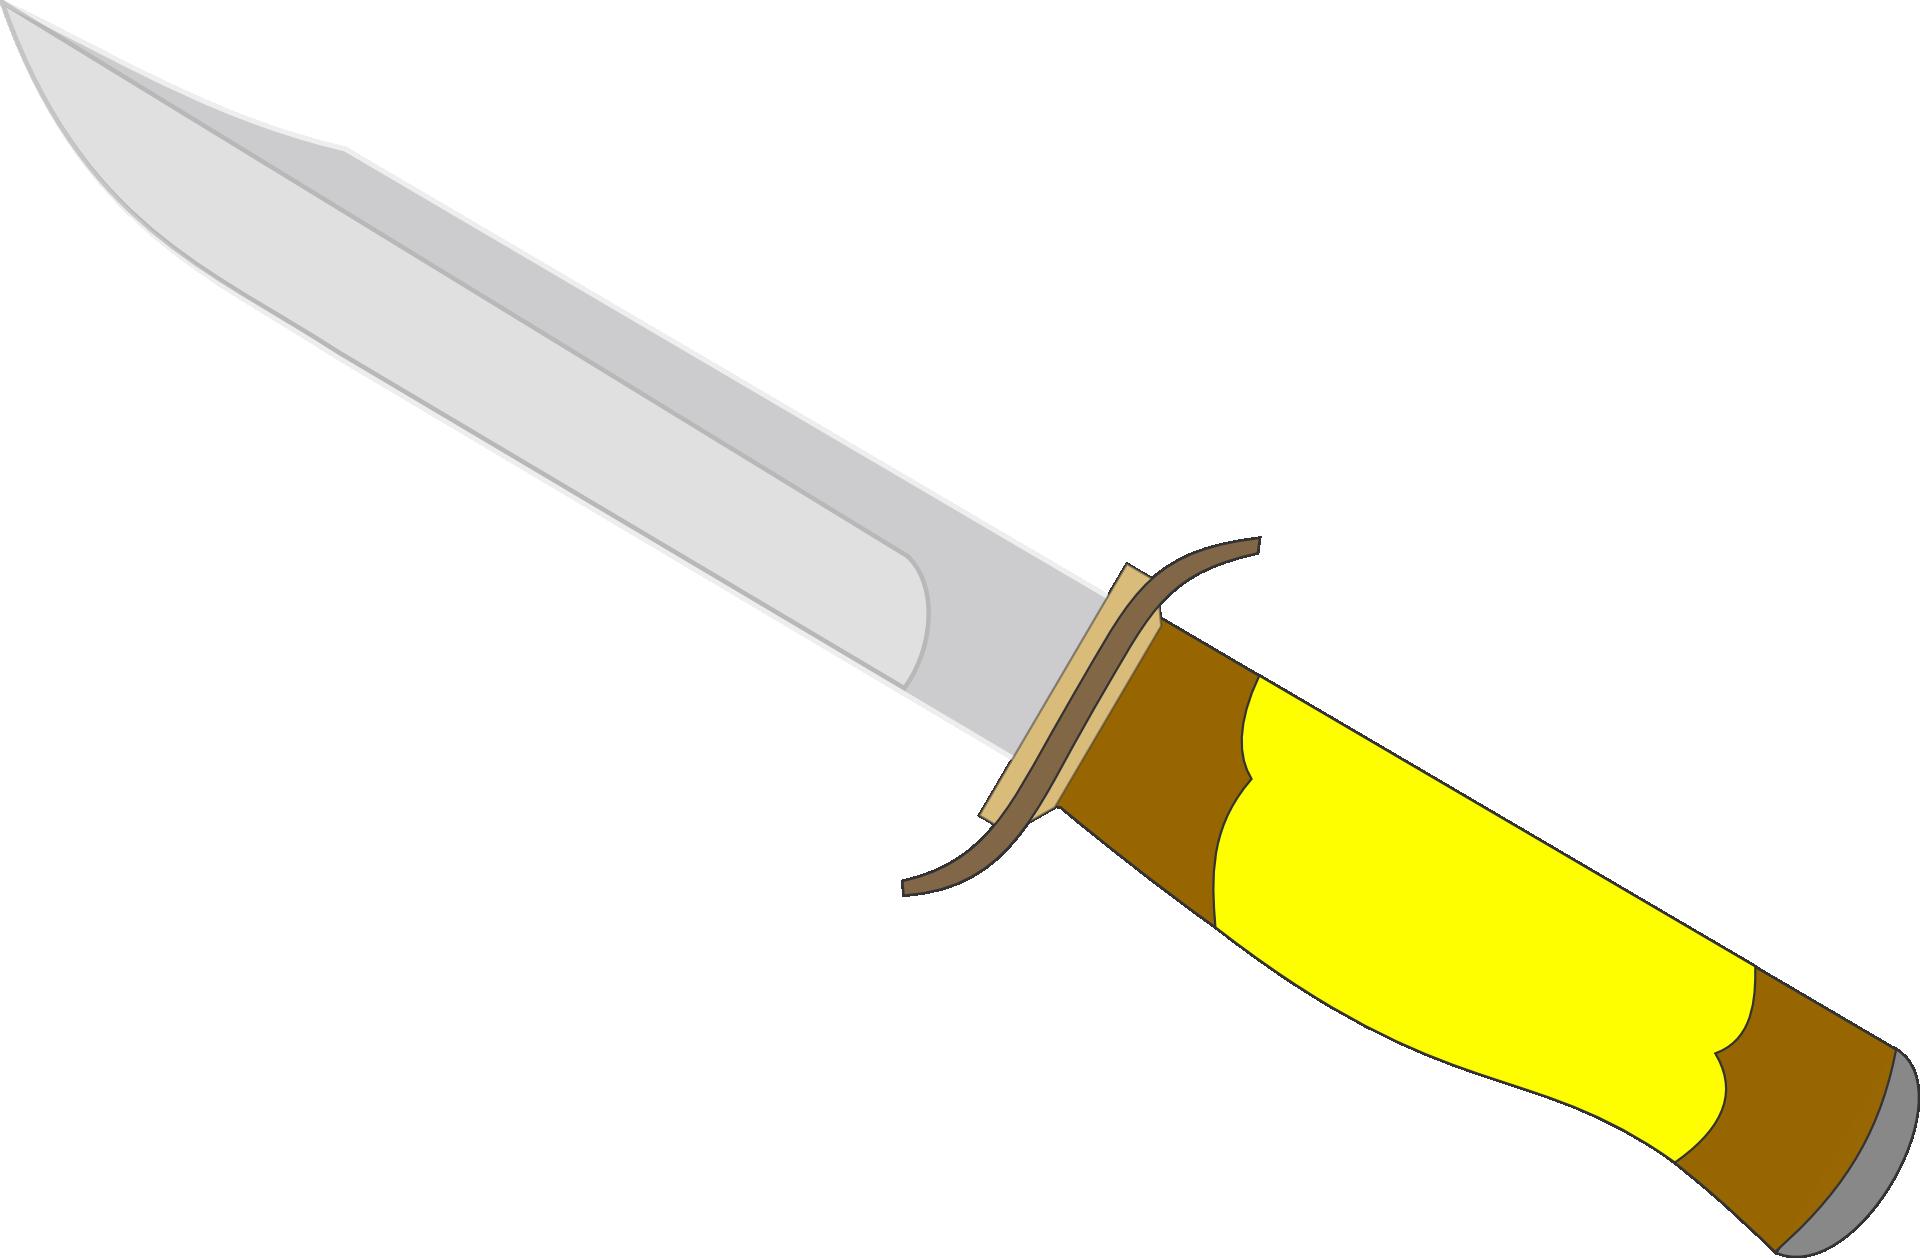 Knife Vectormetal Kitchen Toolsharp  Free PSDVectorIcons